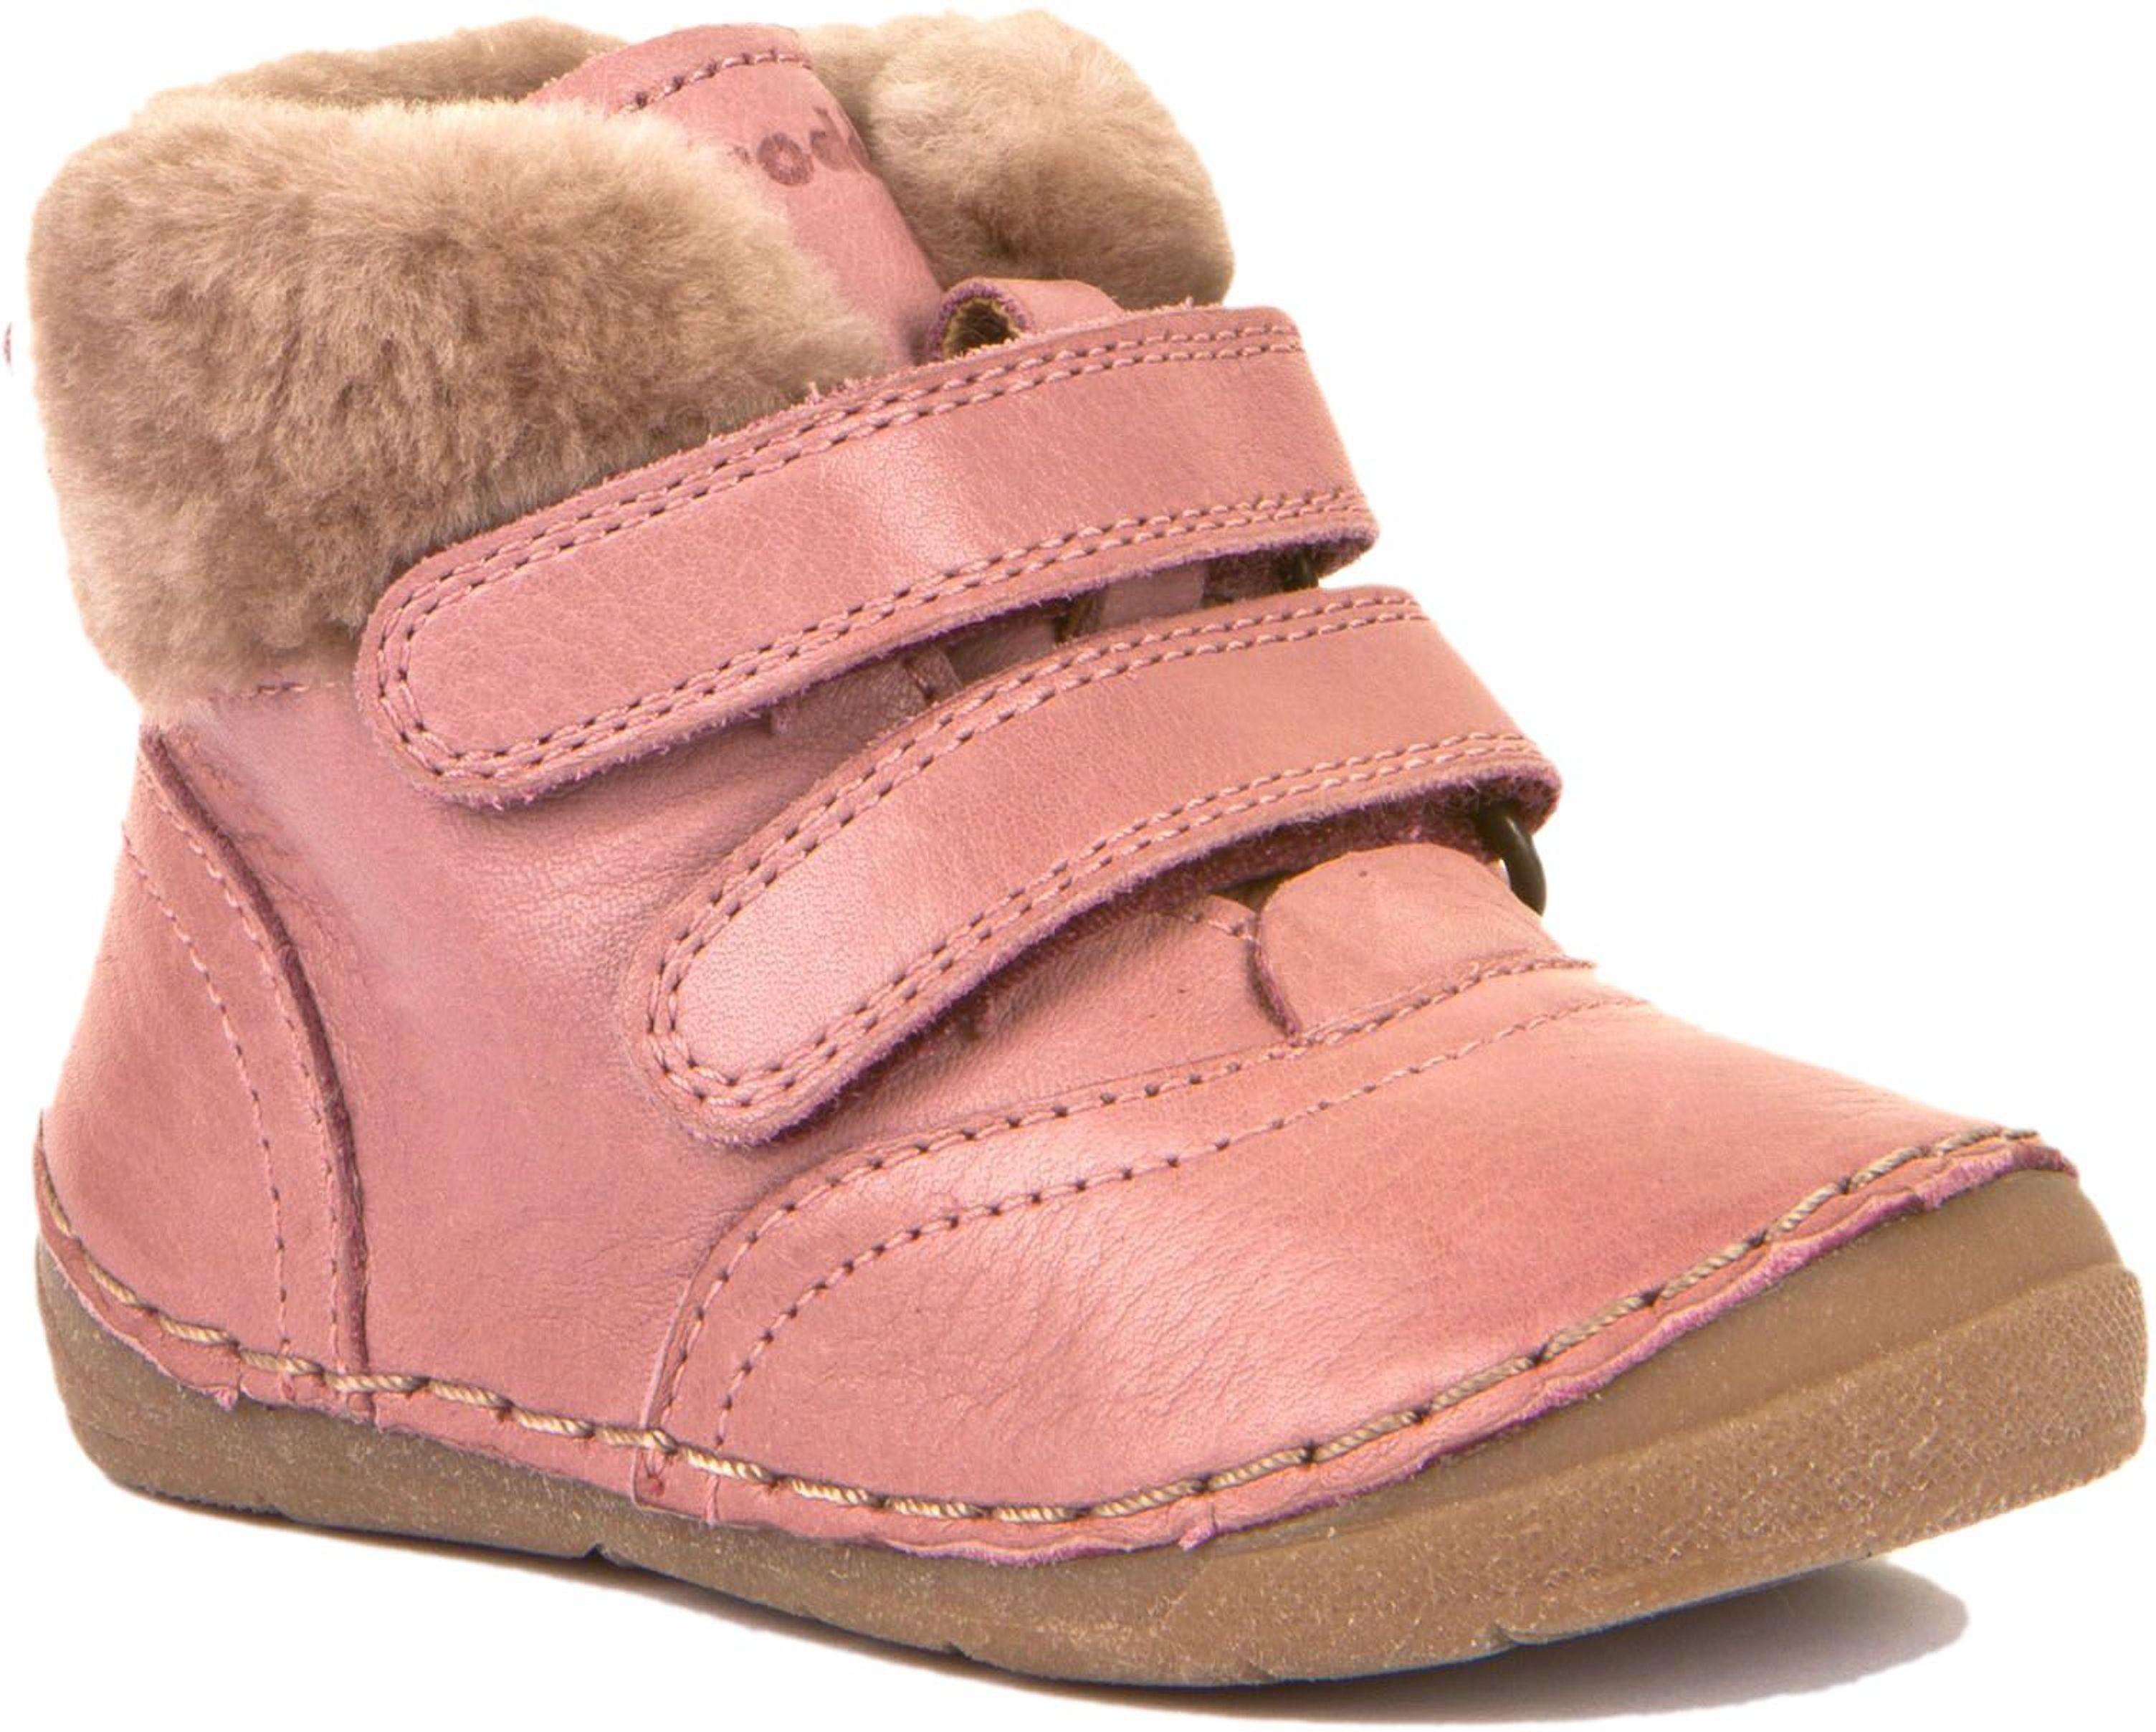 Froddo Baby Winterschuh P Furry Fellfutter Pink